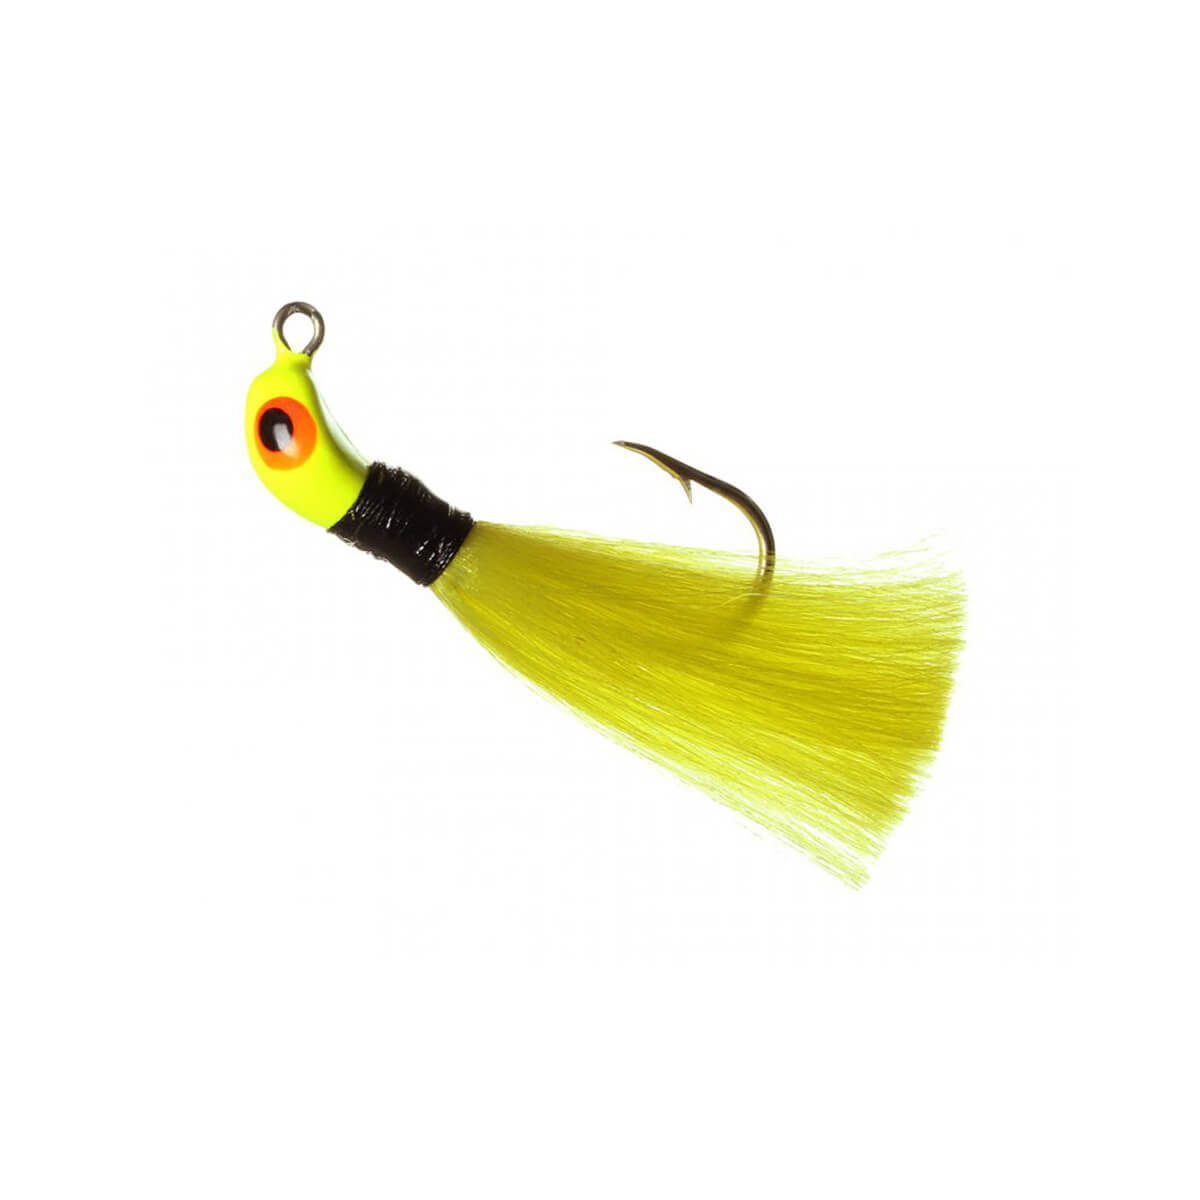 Jig Lori Tamanho P 8 g  - Pró Pesca Shop